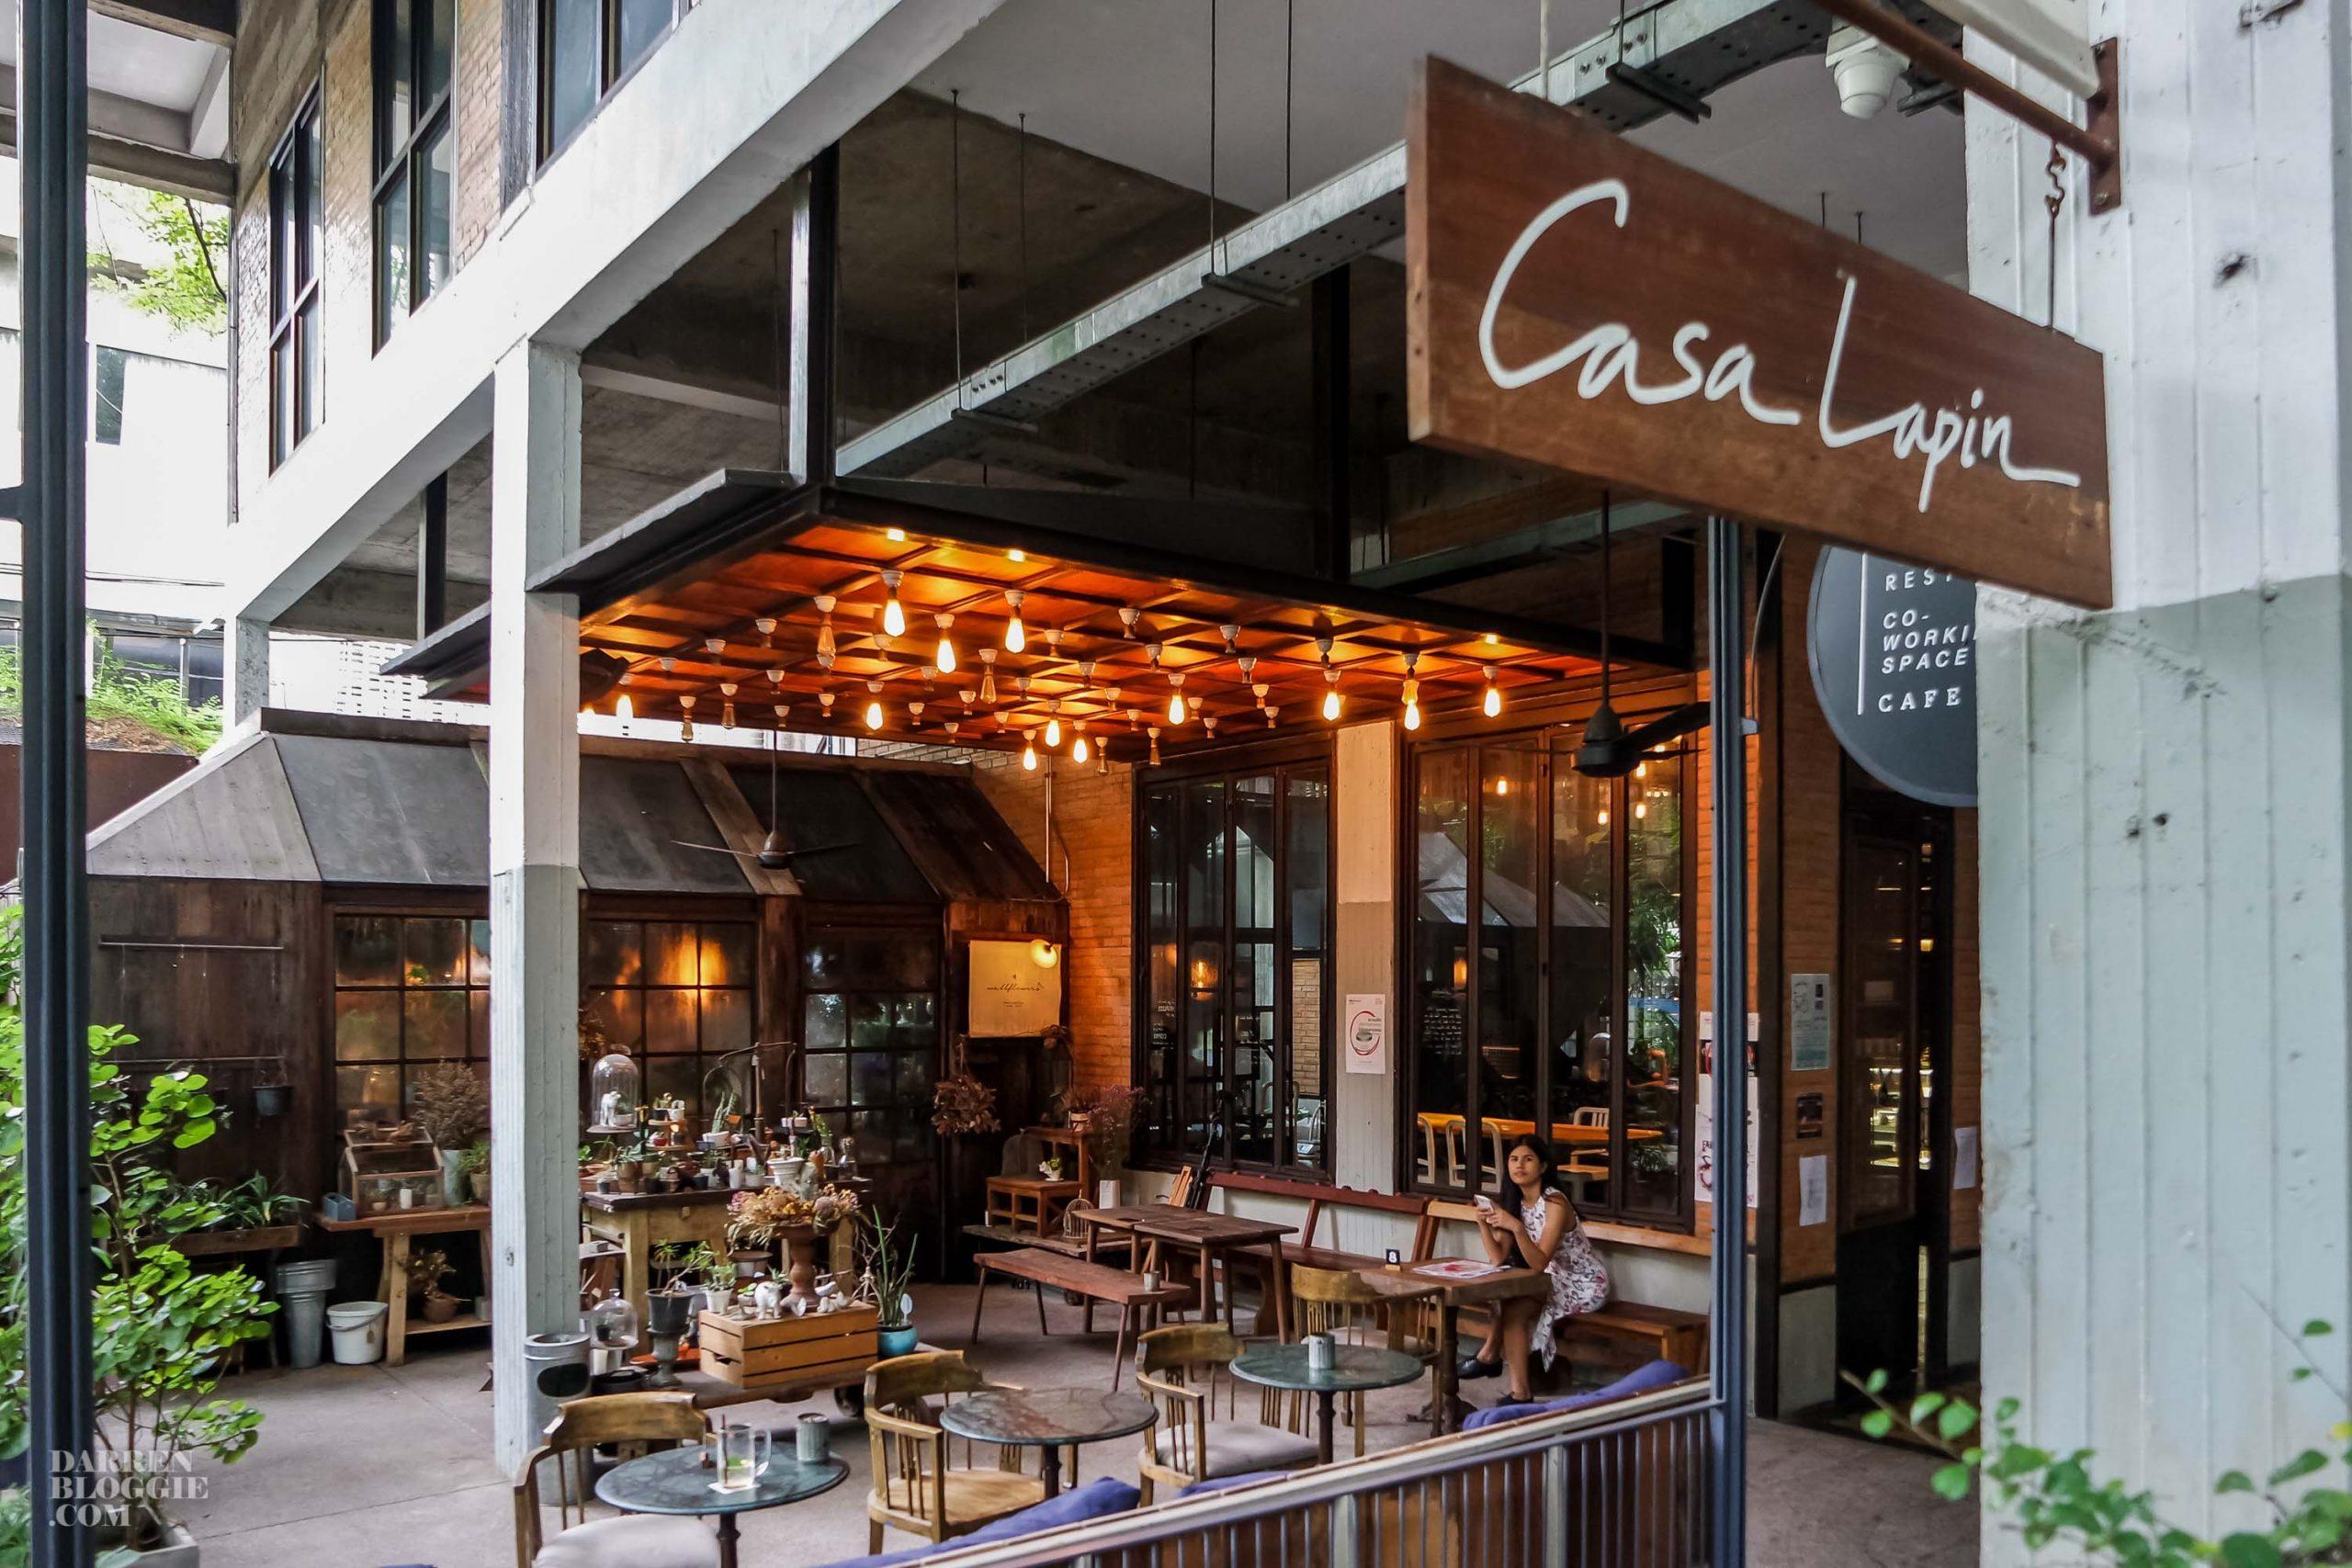 casa-lapin-x26-thailand-bangkok-cafe